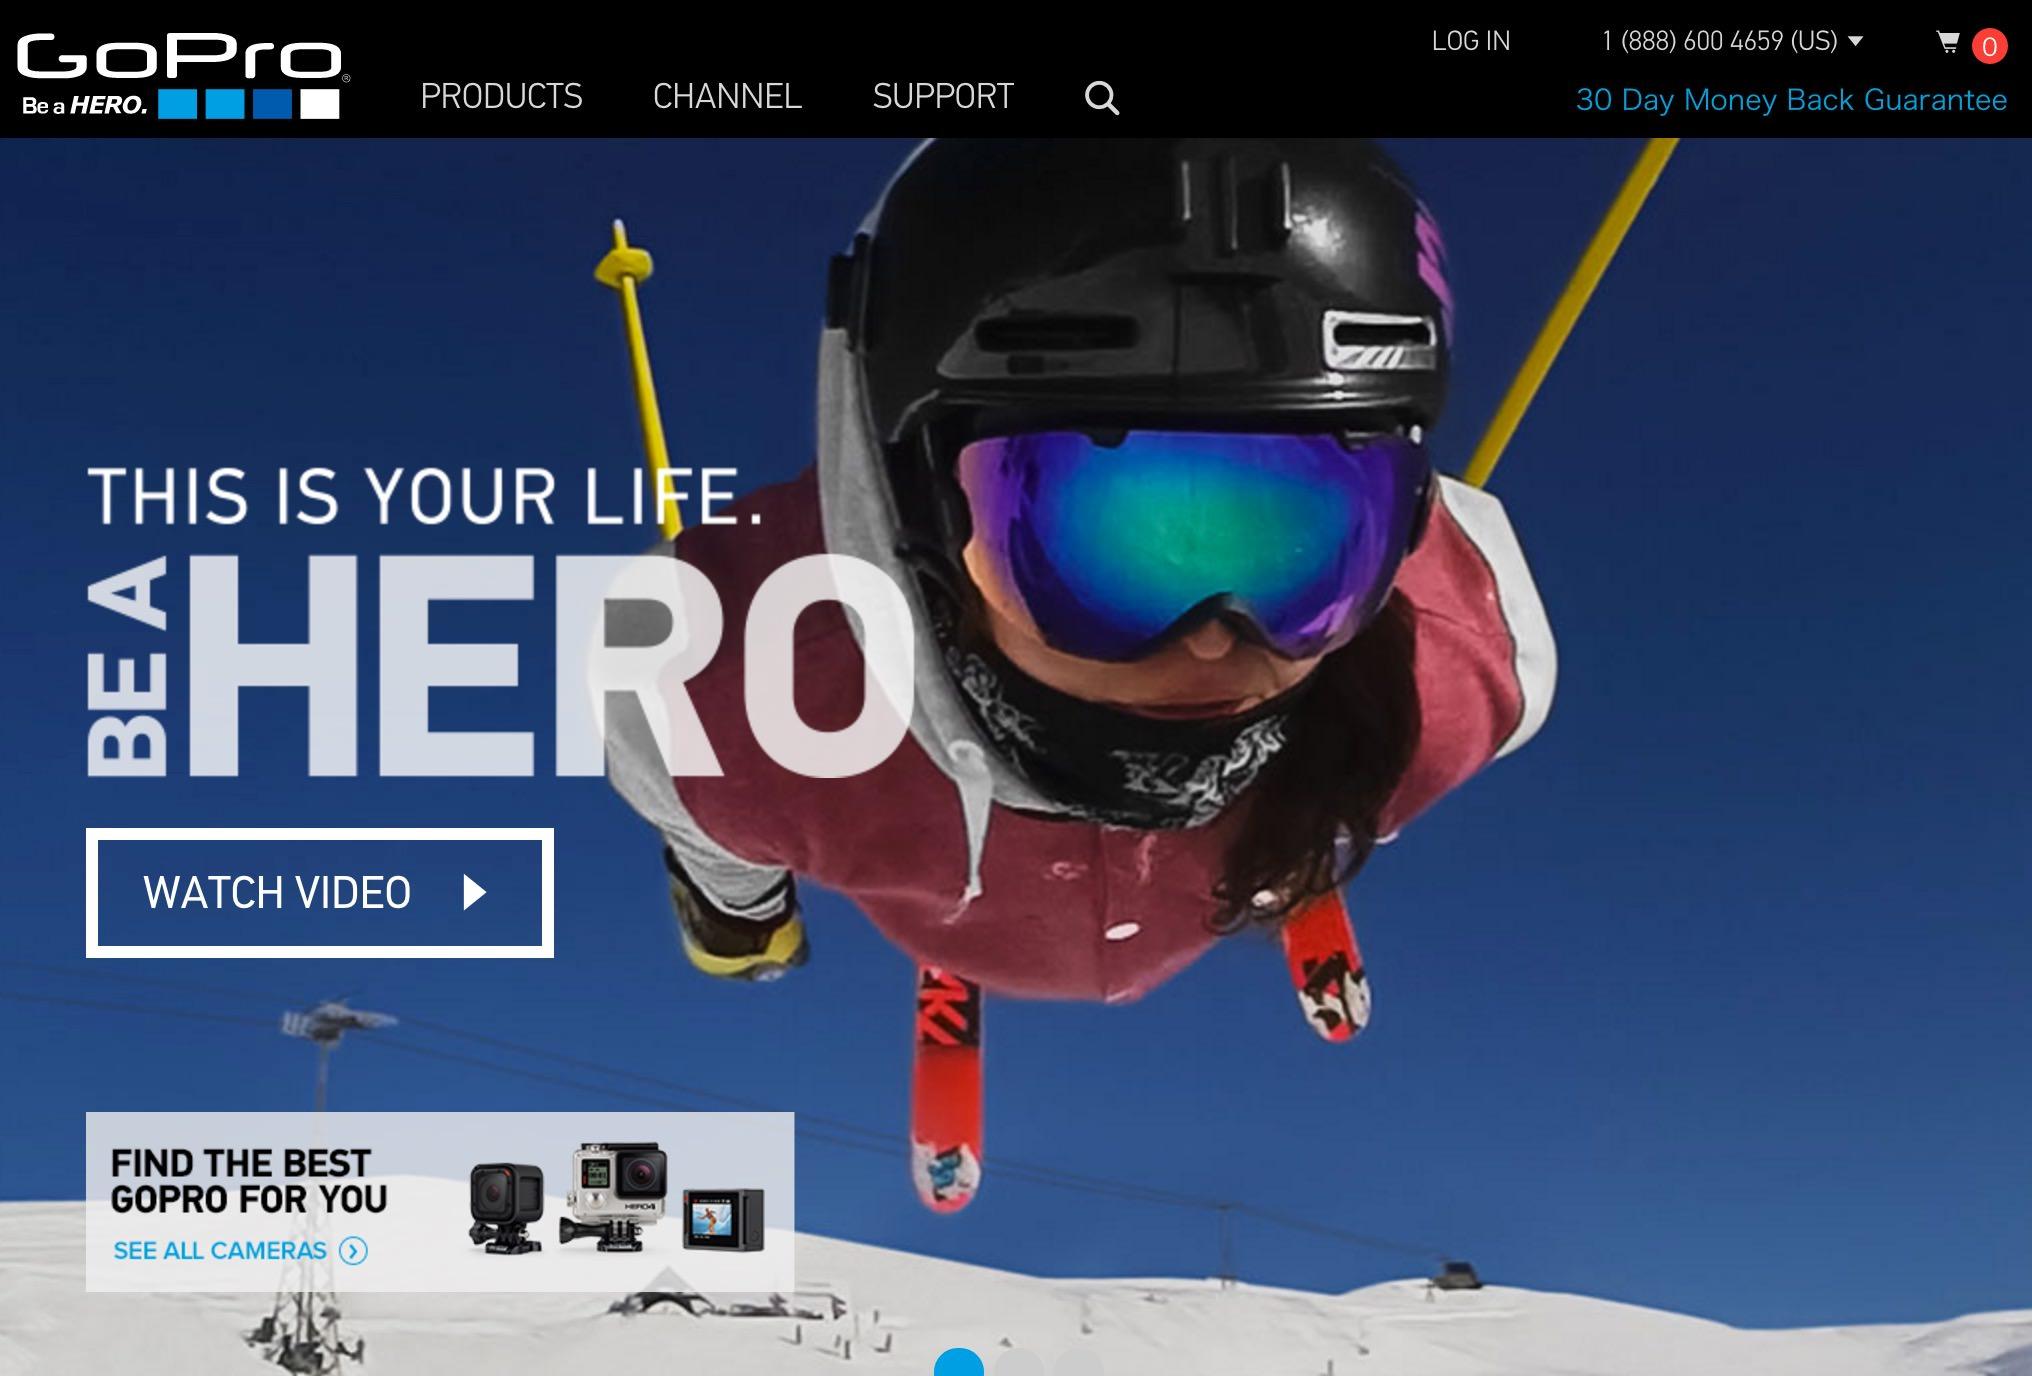 GoPro、Periscopeでライブ配信可能に → スポーツやファッションショーの中継が手軽に実現